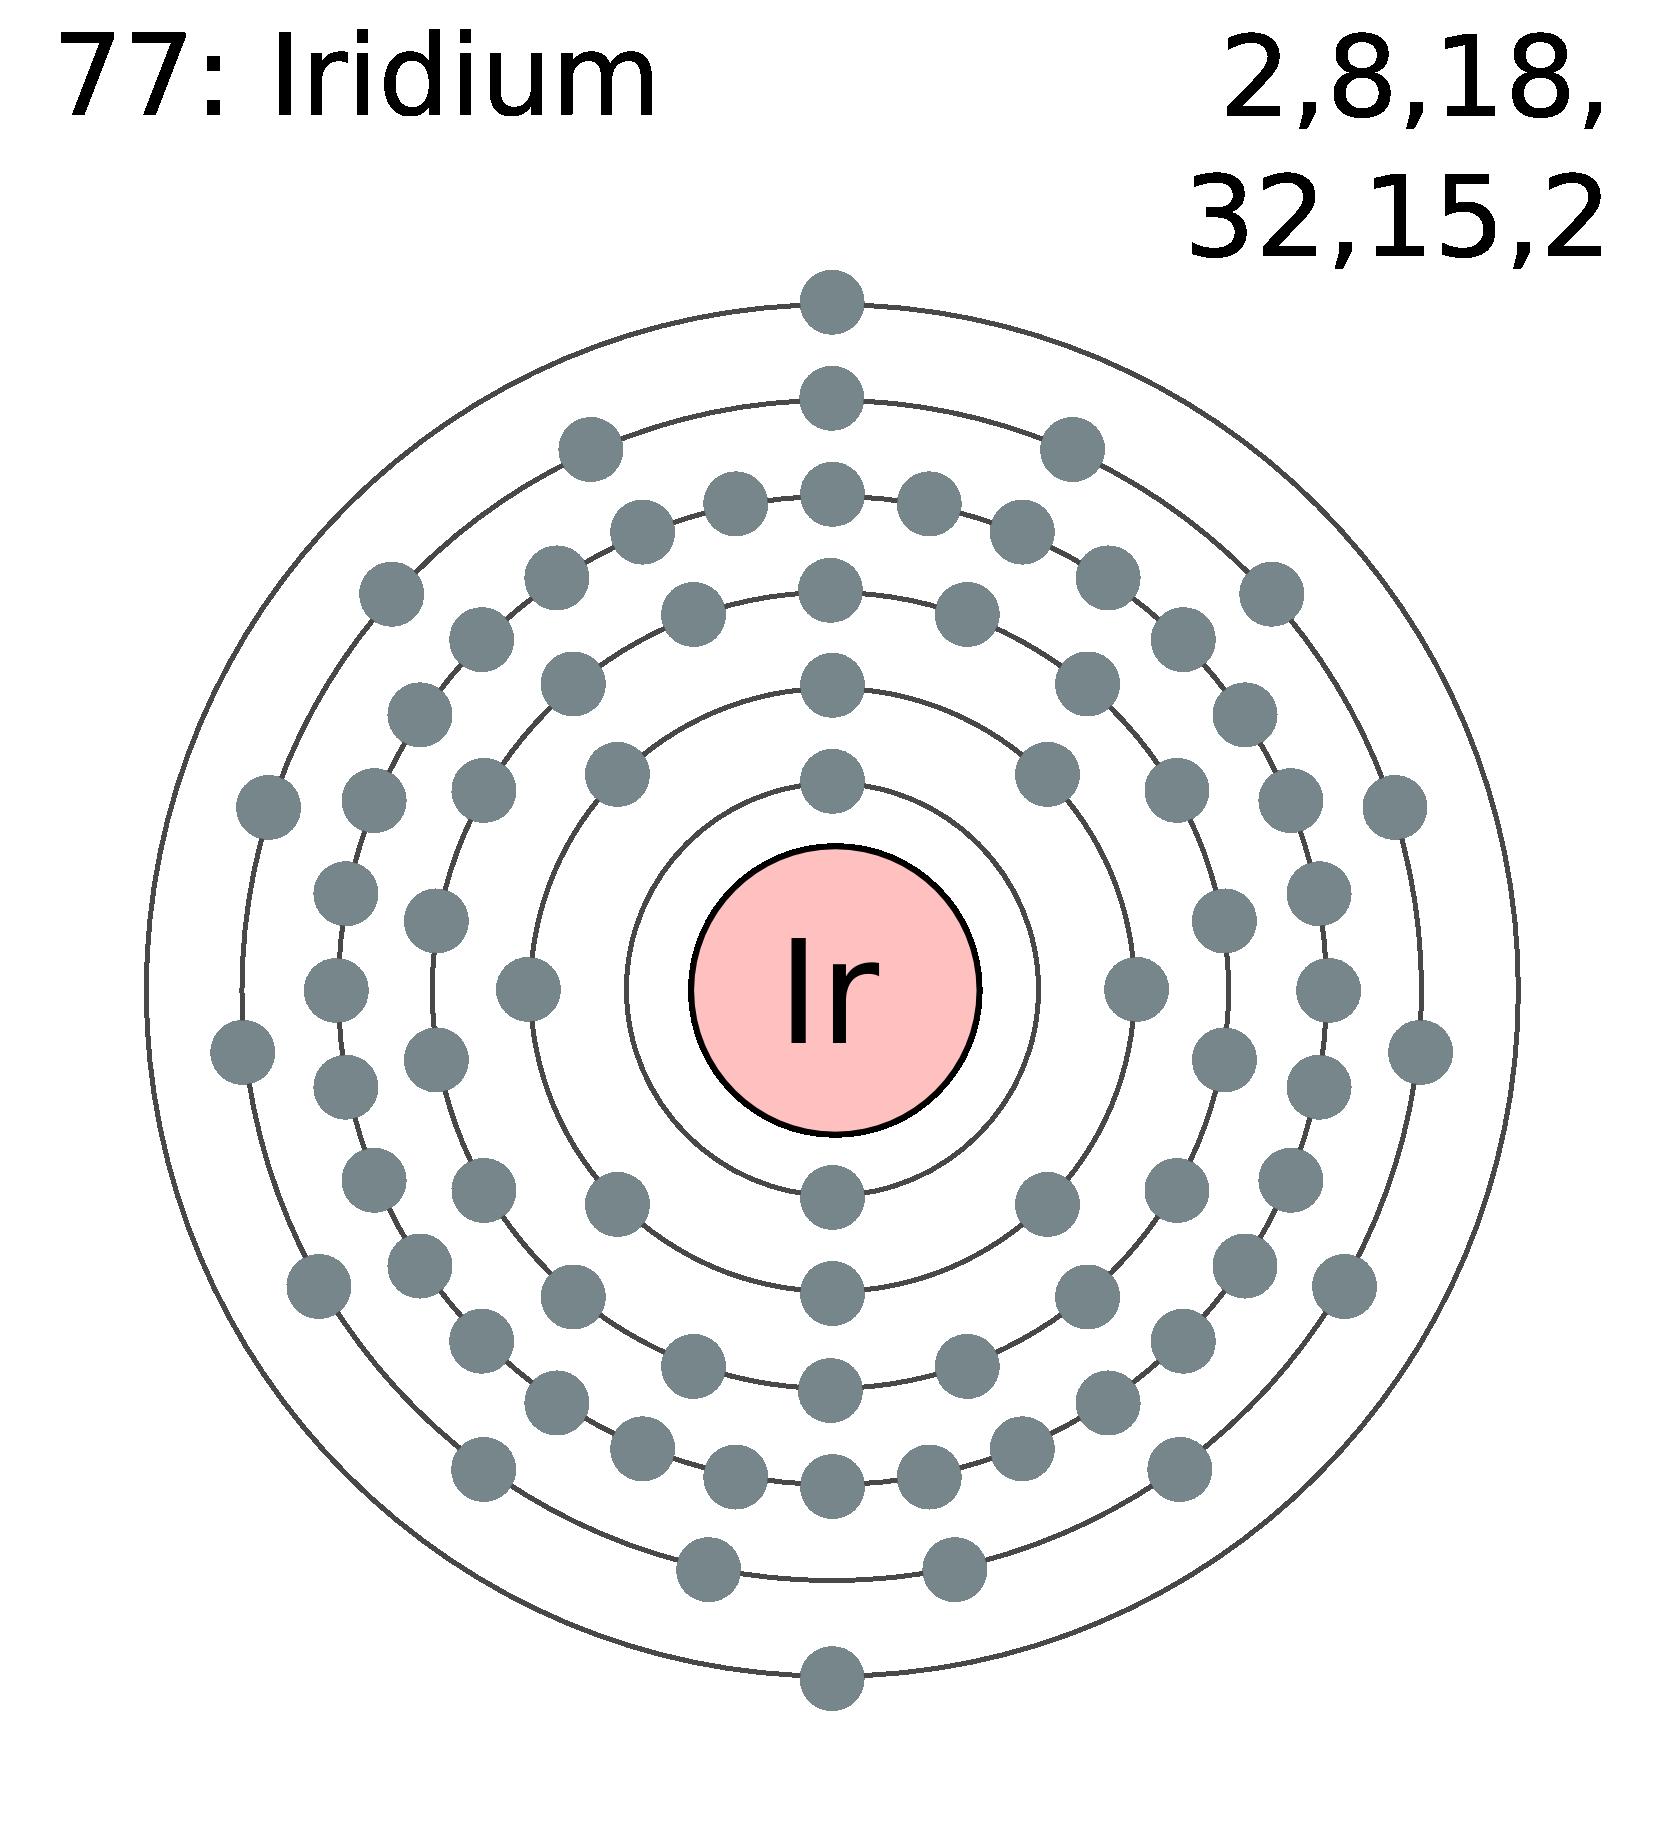 File Electron Shell 077 Iridium Png